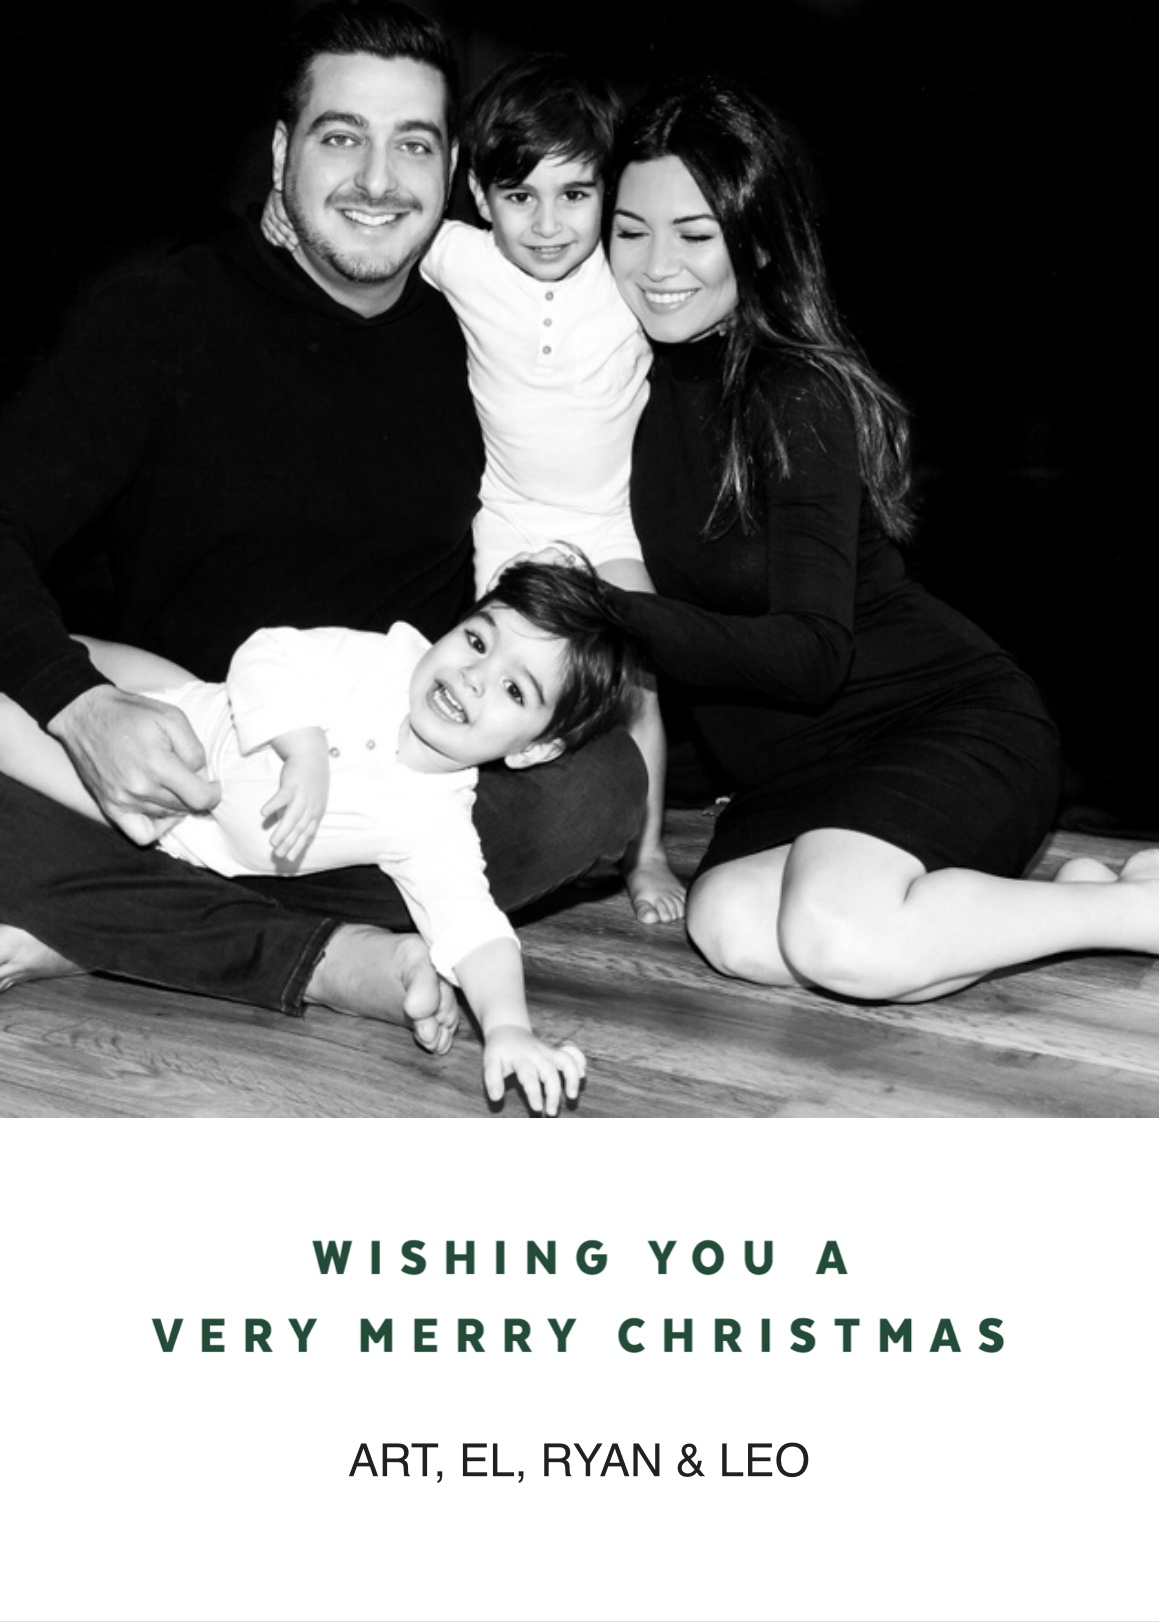 Our 2018 Christmas card!